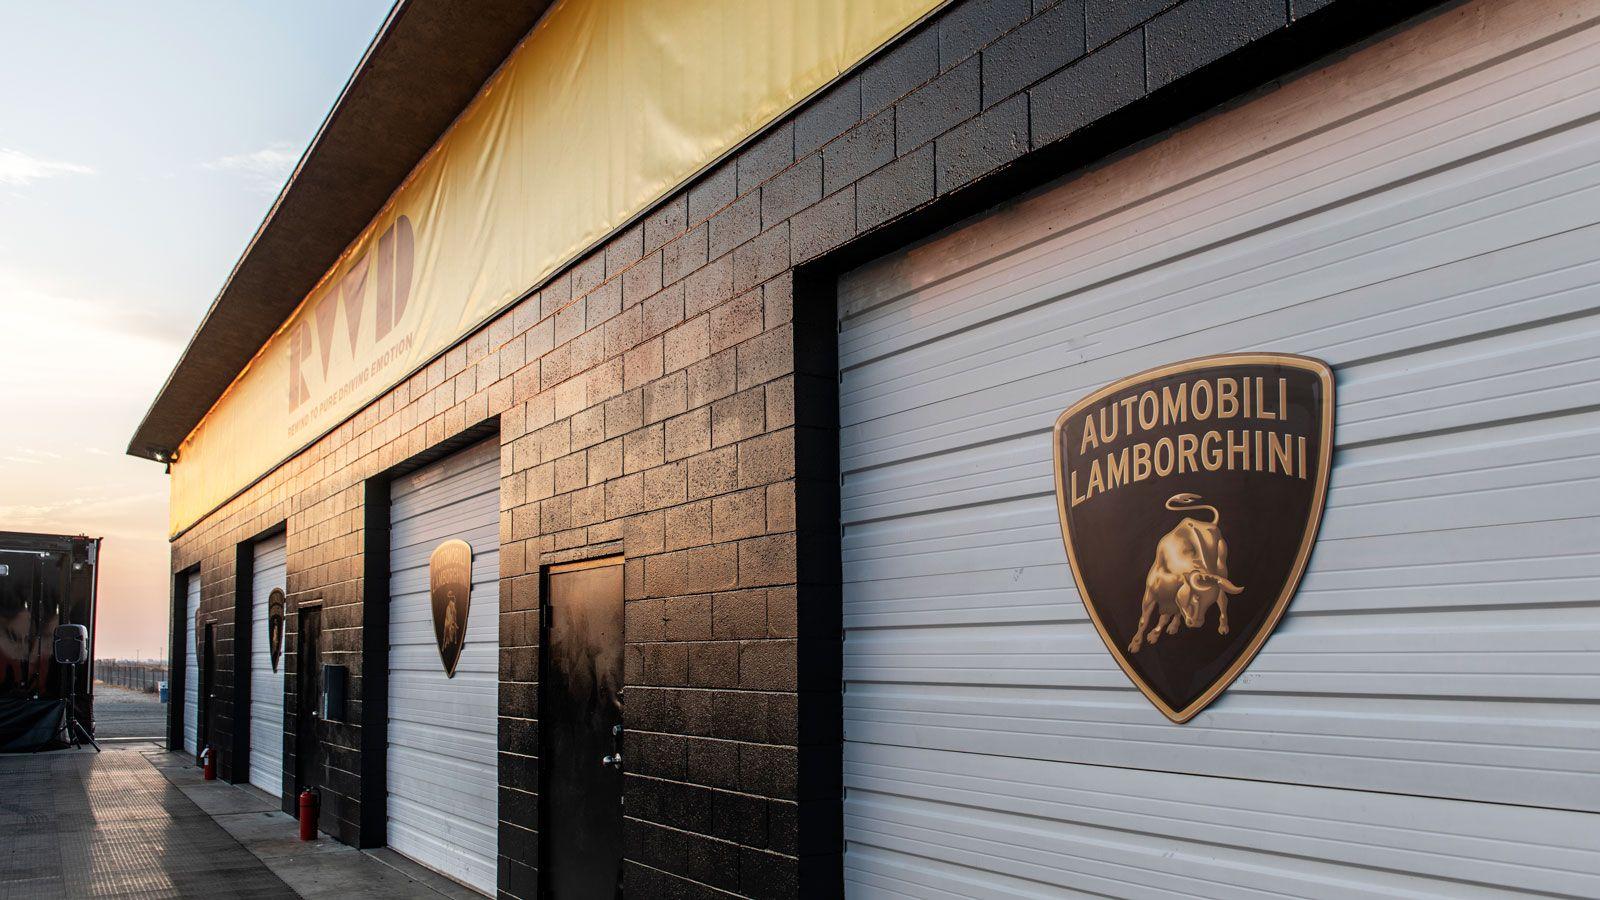 Lamborghini aluminum signs